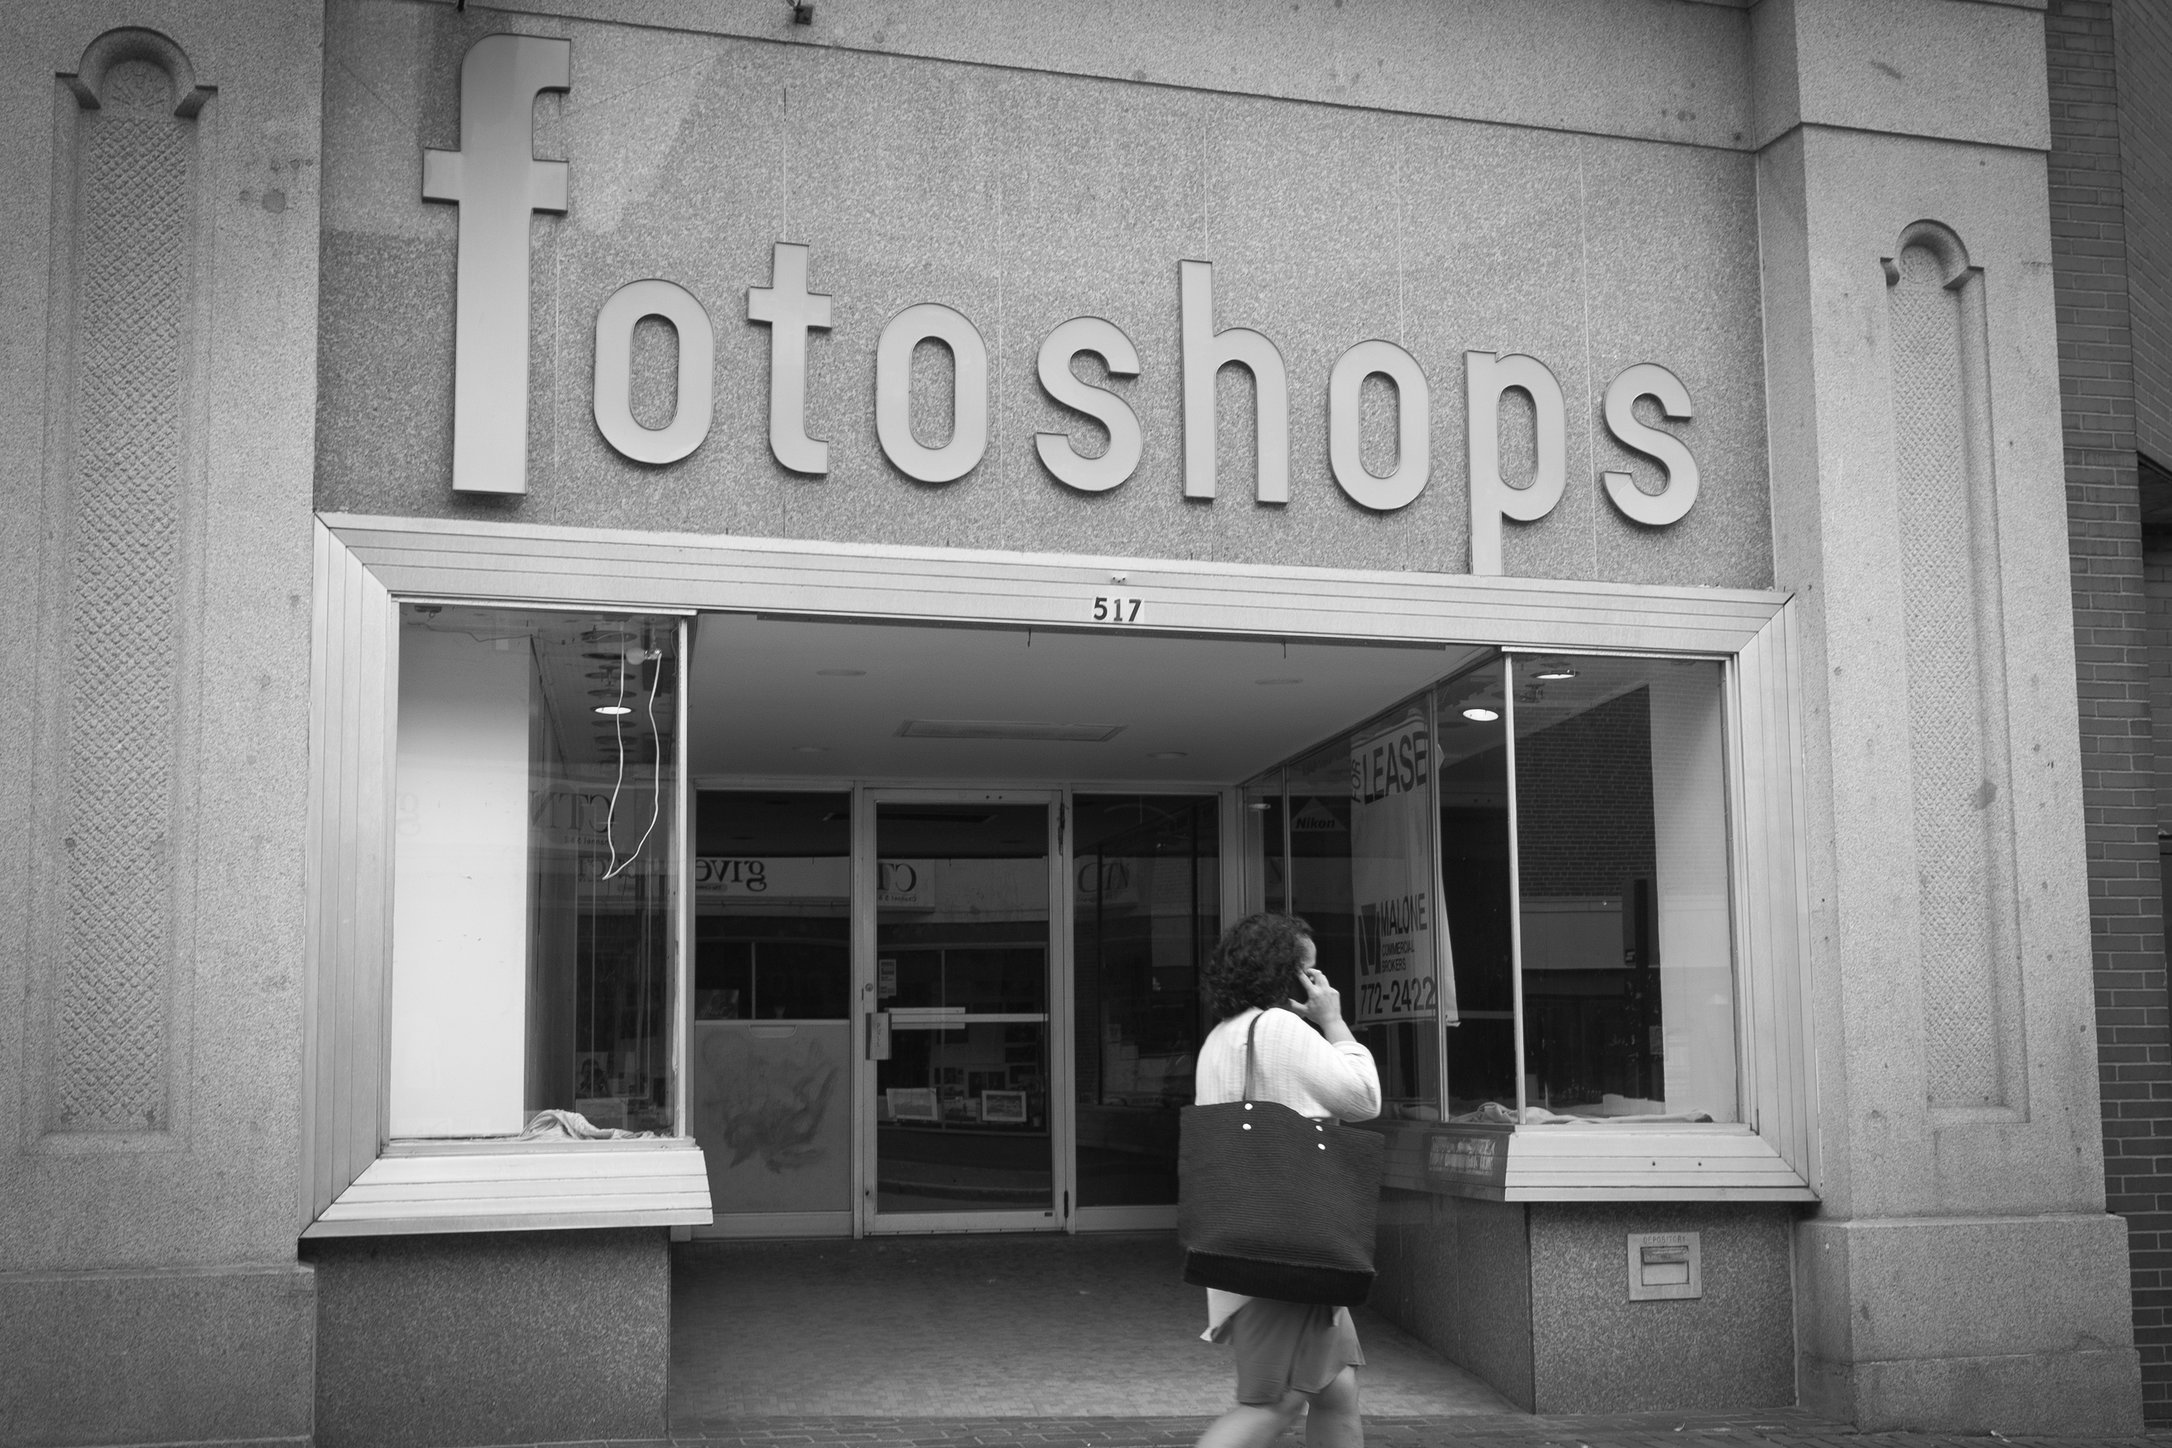 FOTOSHOPS